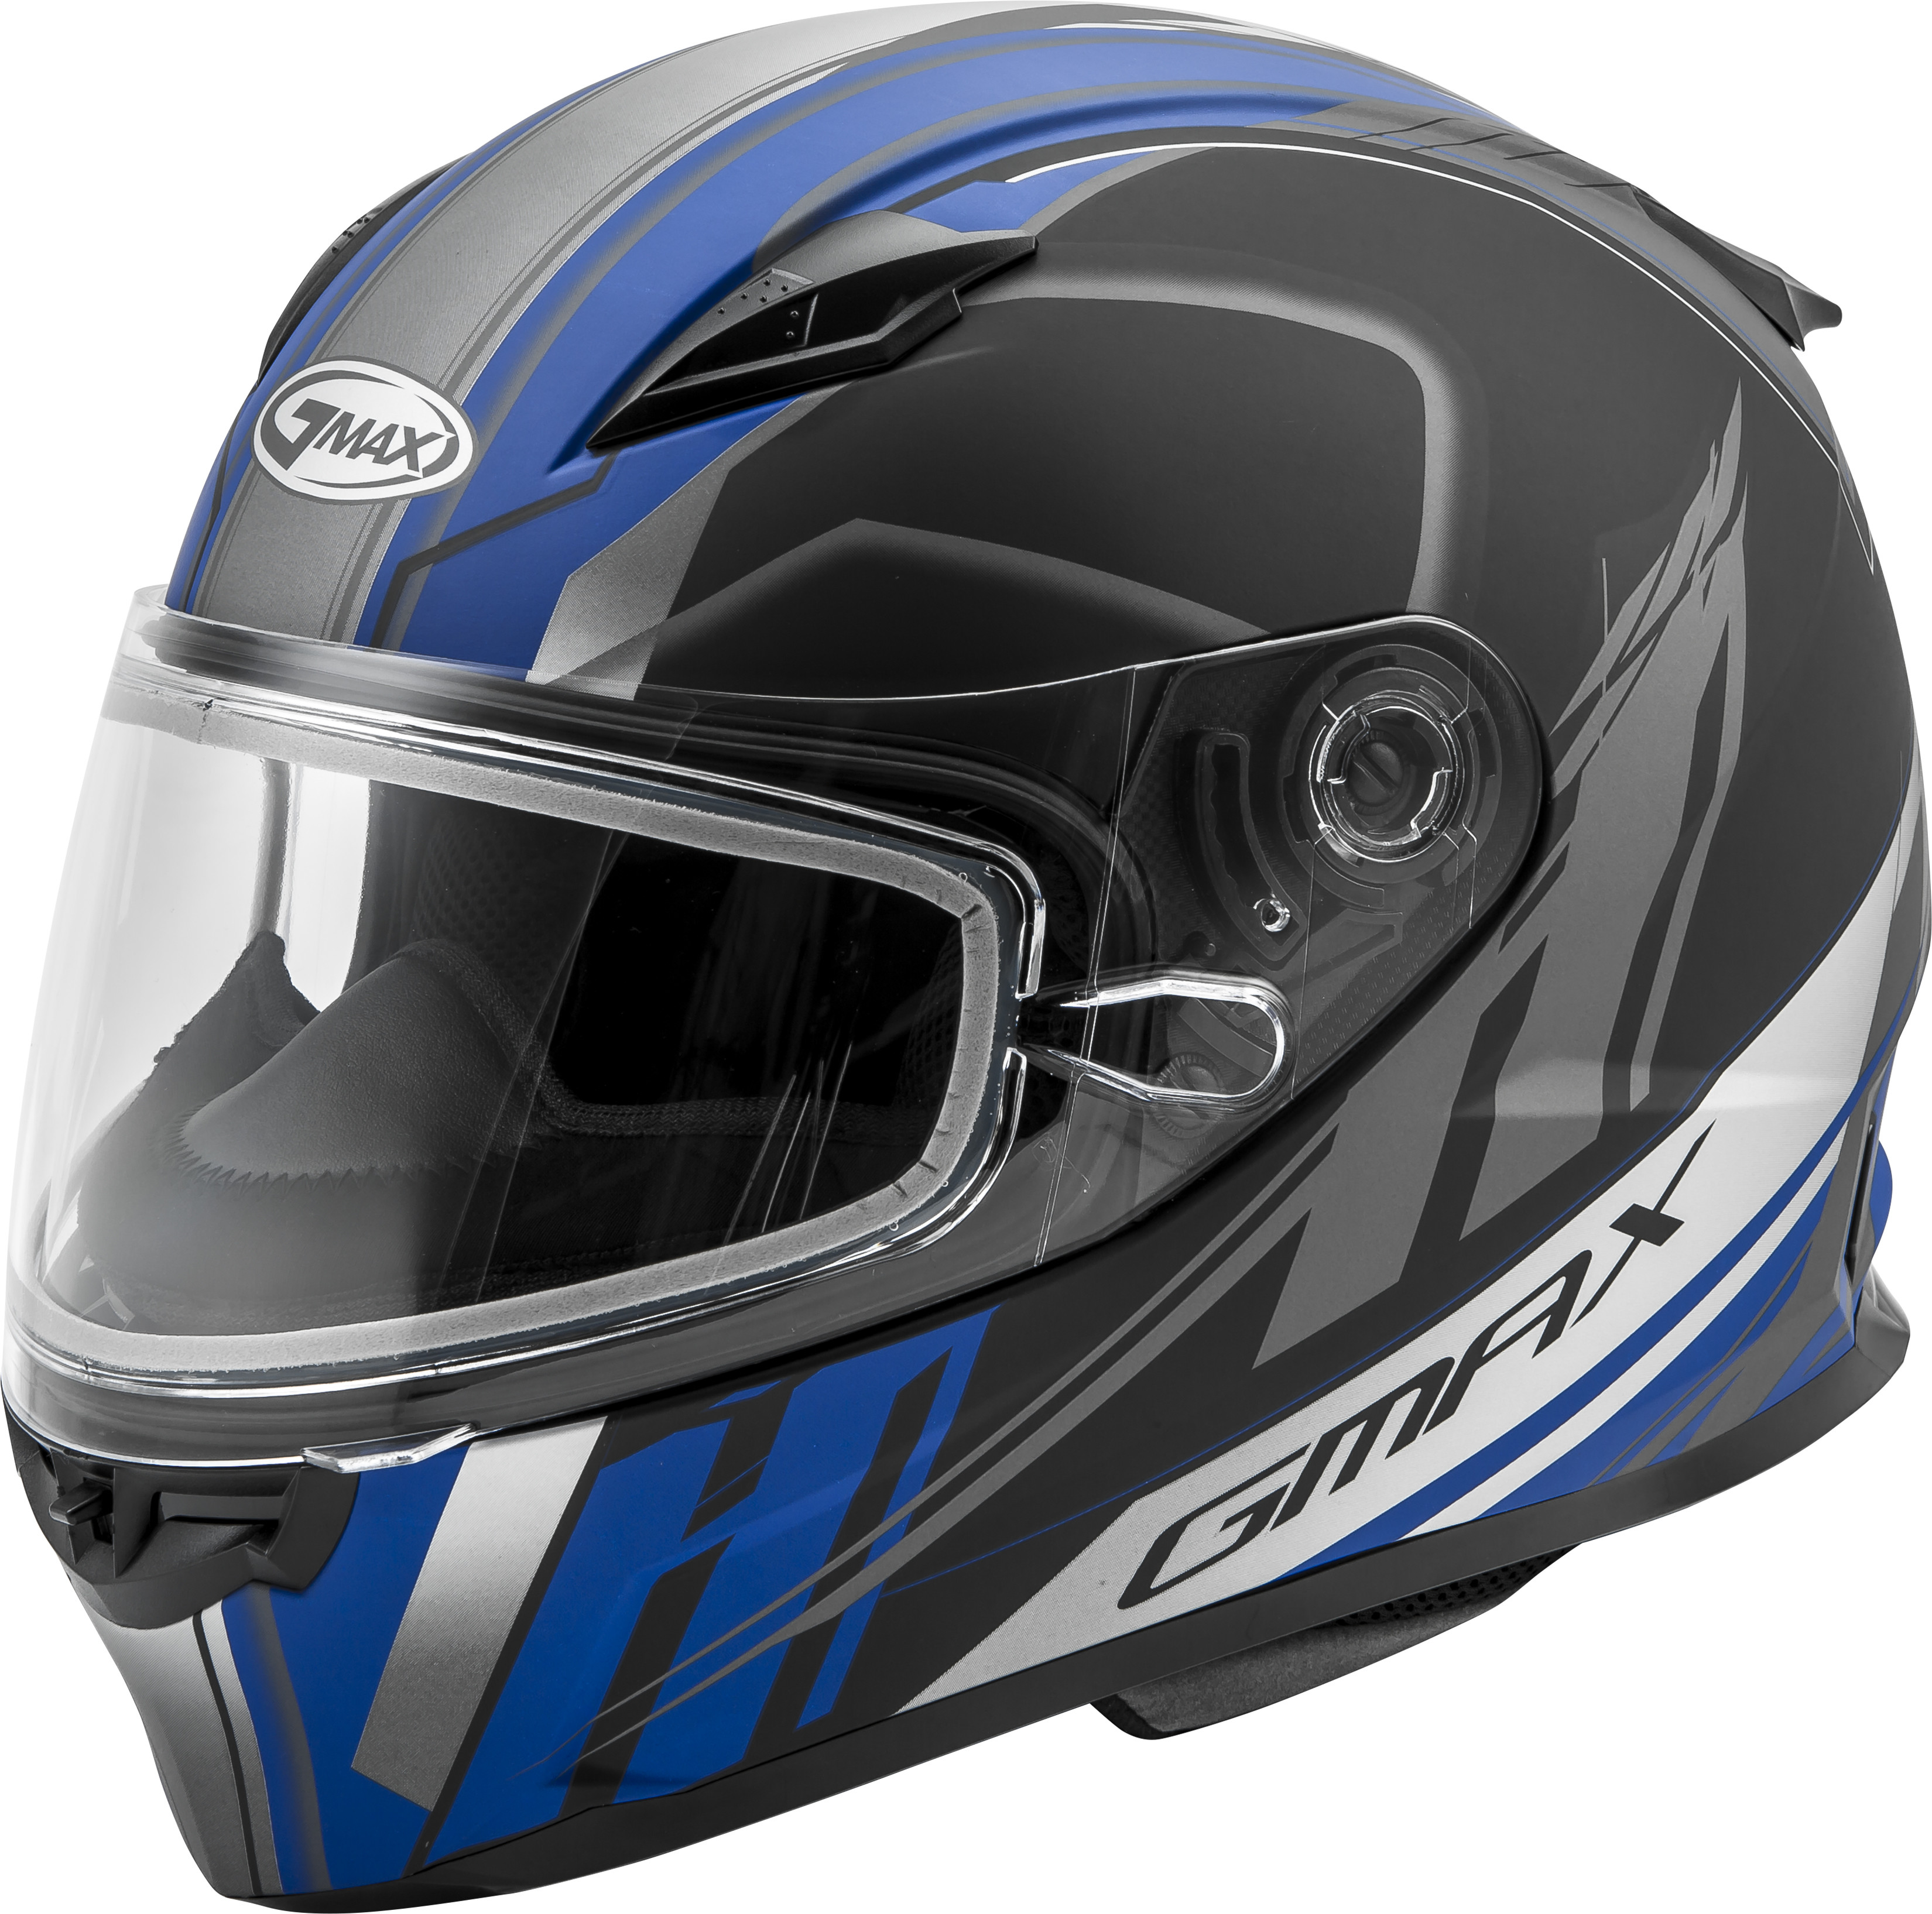 YOUTH GM49Y Rogue Snow,  Helmet MATTE 72-6009YS